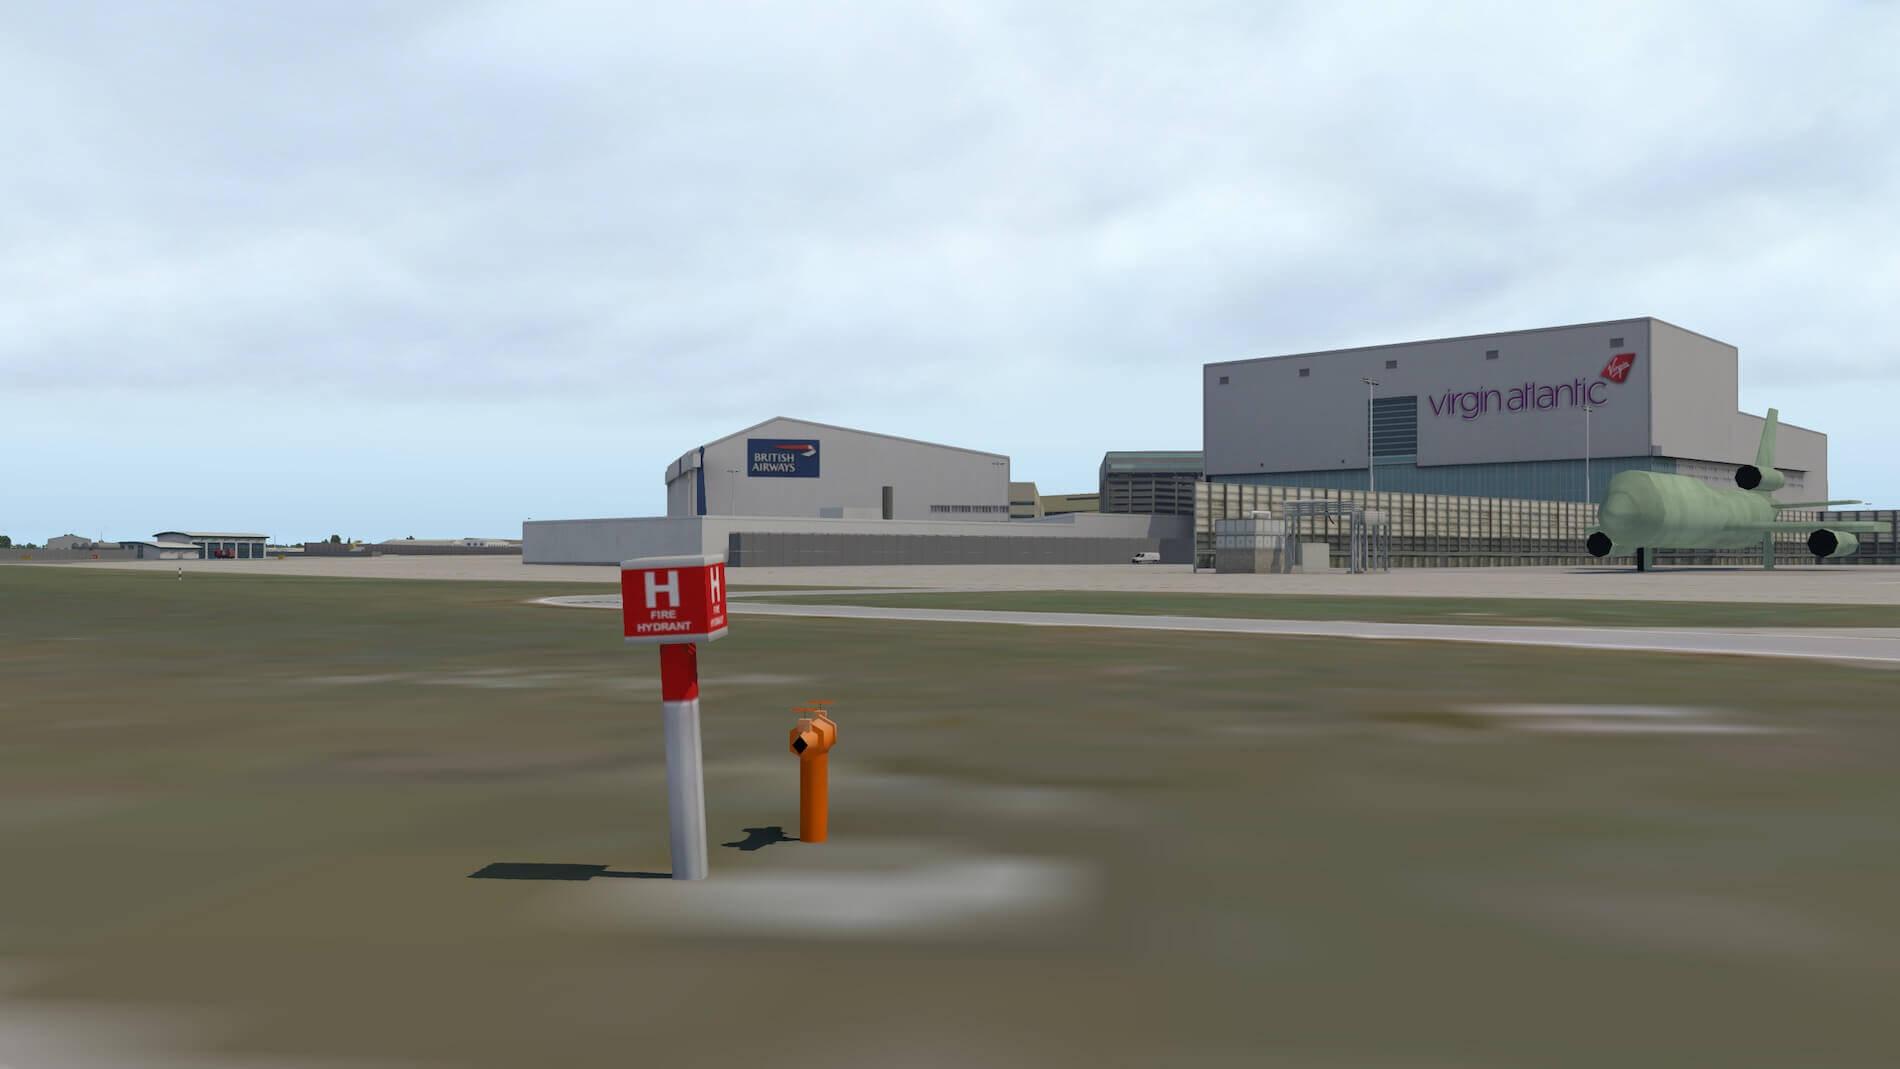 Airport Review | Aerosoft London Heathrow | X-Plained, the